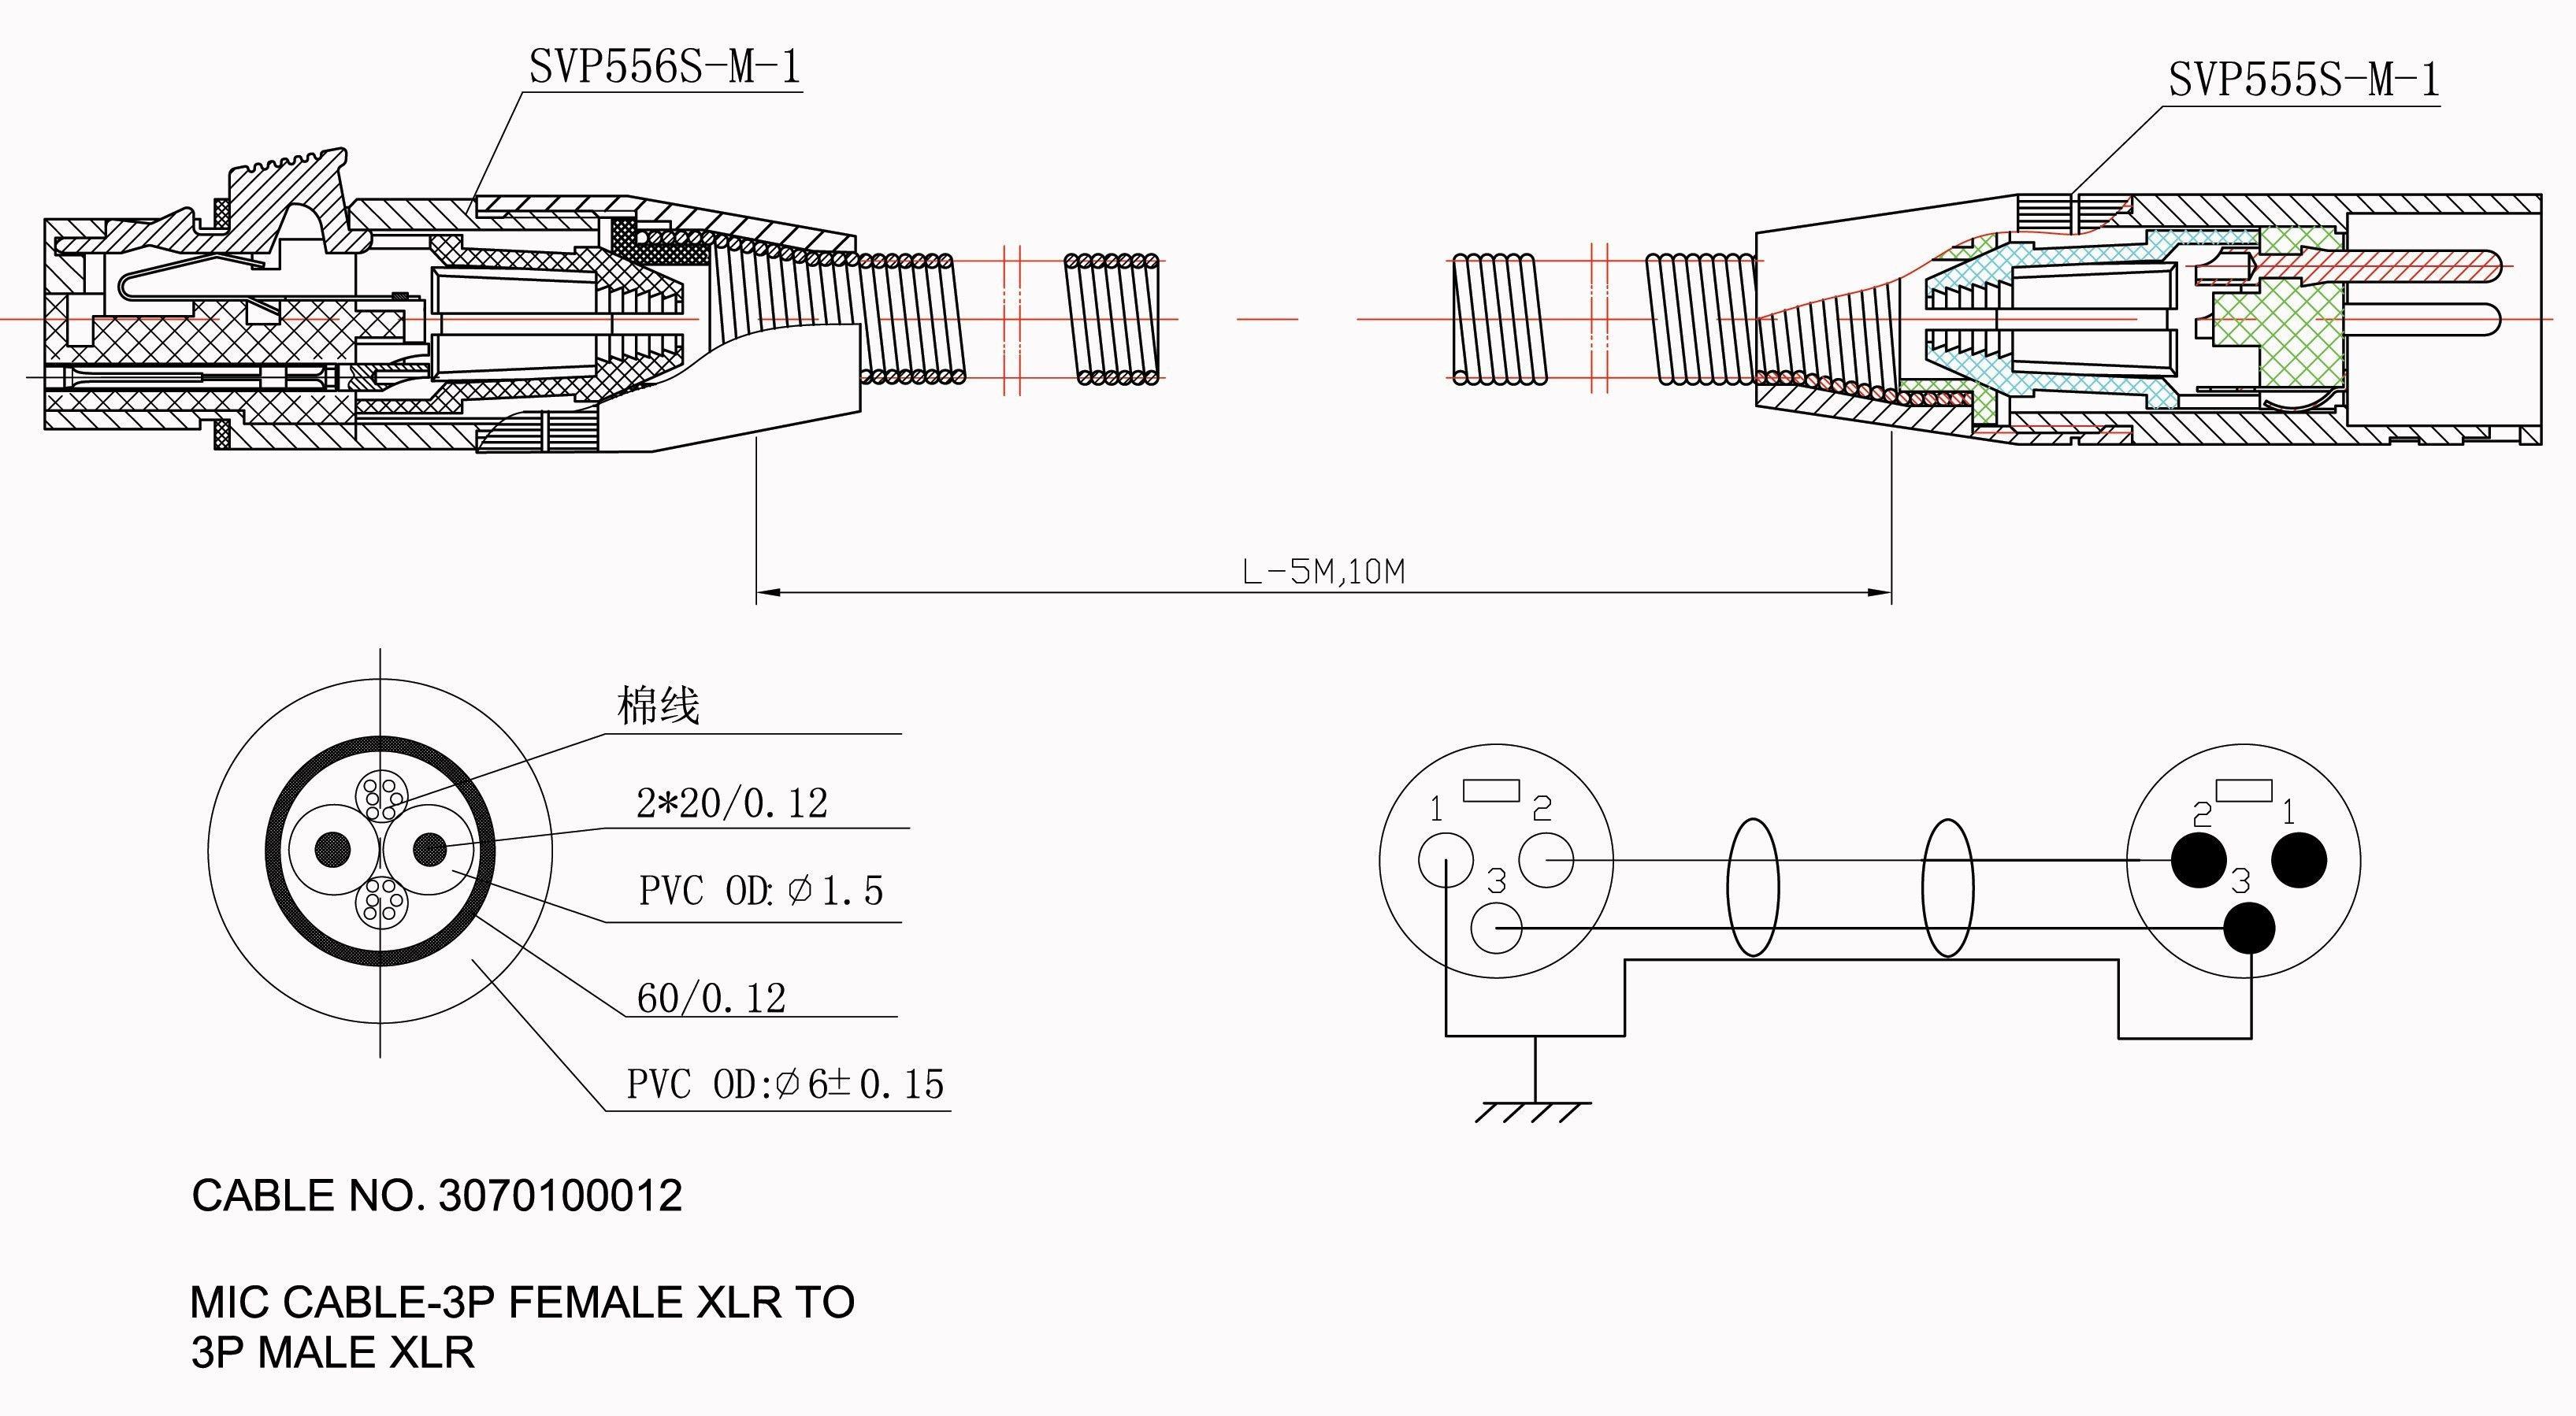 Awesome Wiring Diagram Downlights Diagrams Digramssample Diagramimages Wiringdiagramsample Wirin Electrical Wiring Diagram Door Repair Garage Service Door